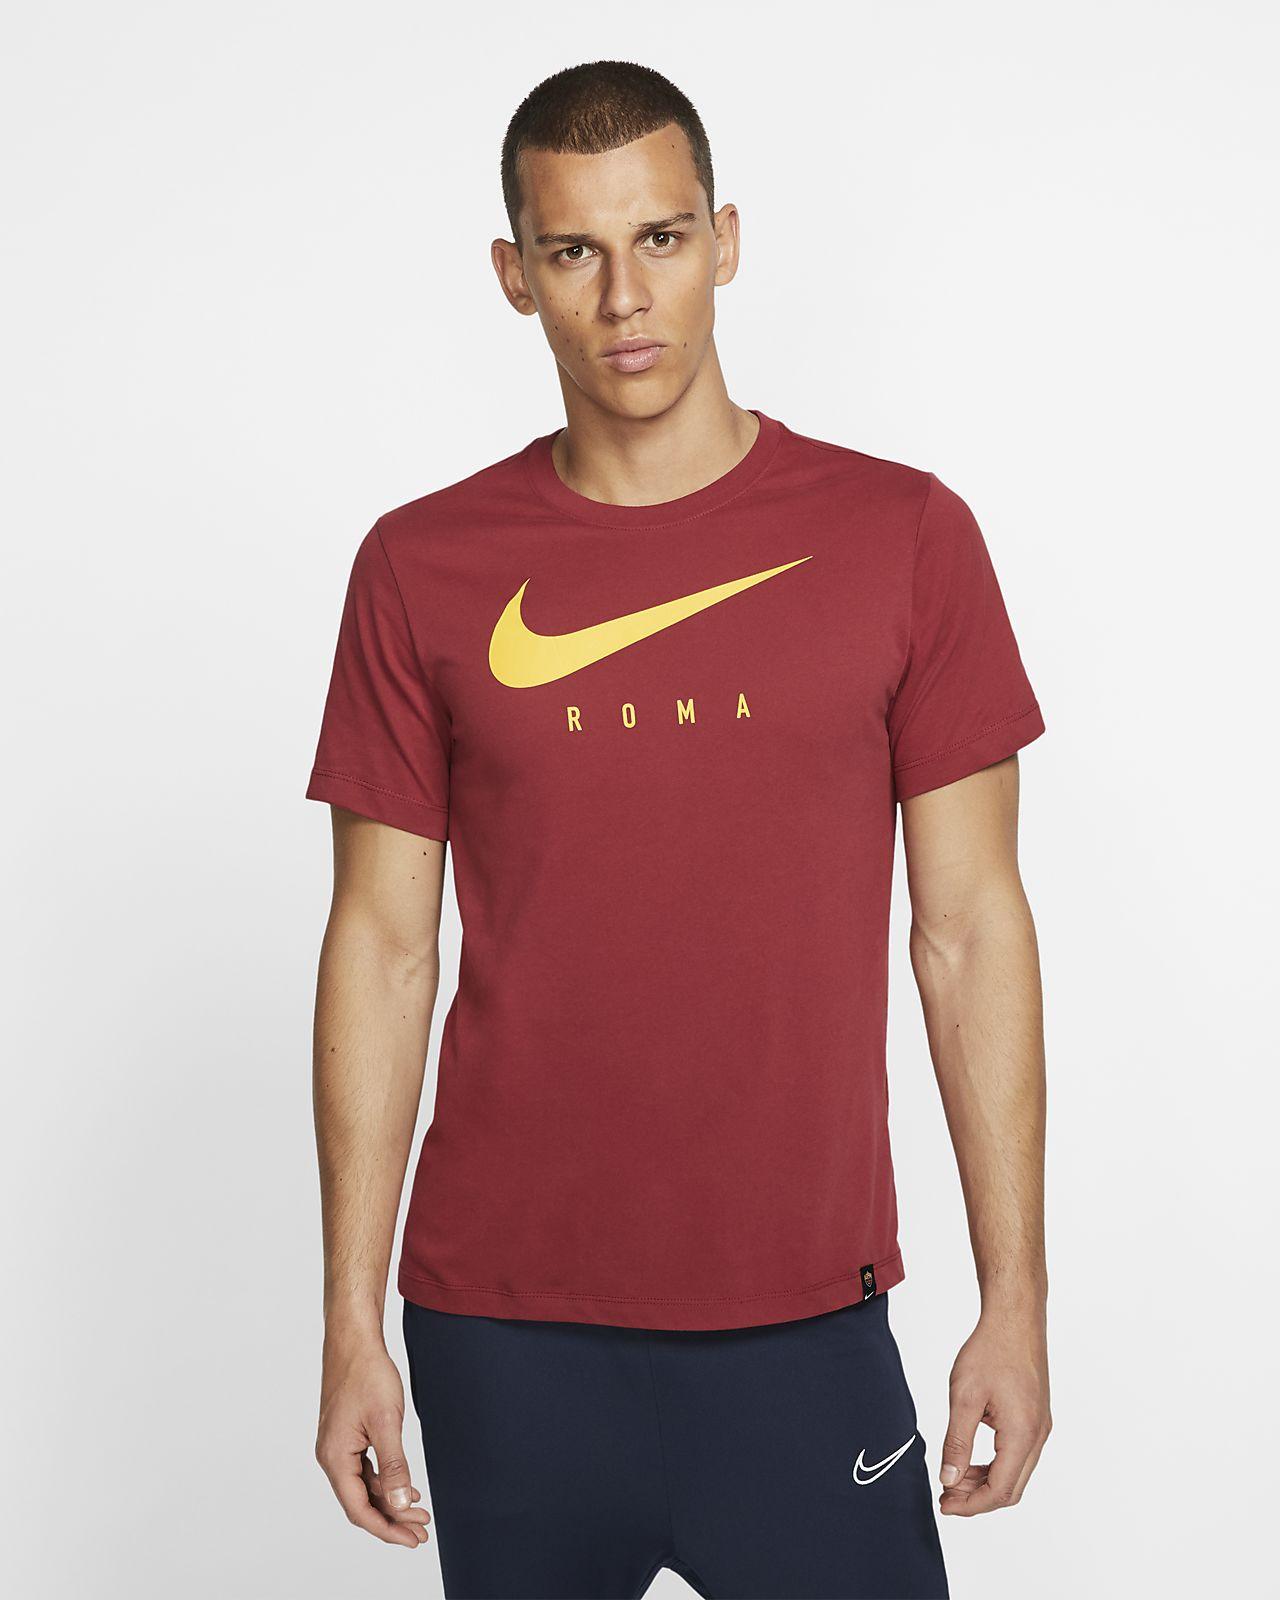 Nike Dri-FIT A.S. Roma Men's Football T-Shirt